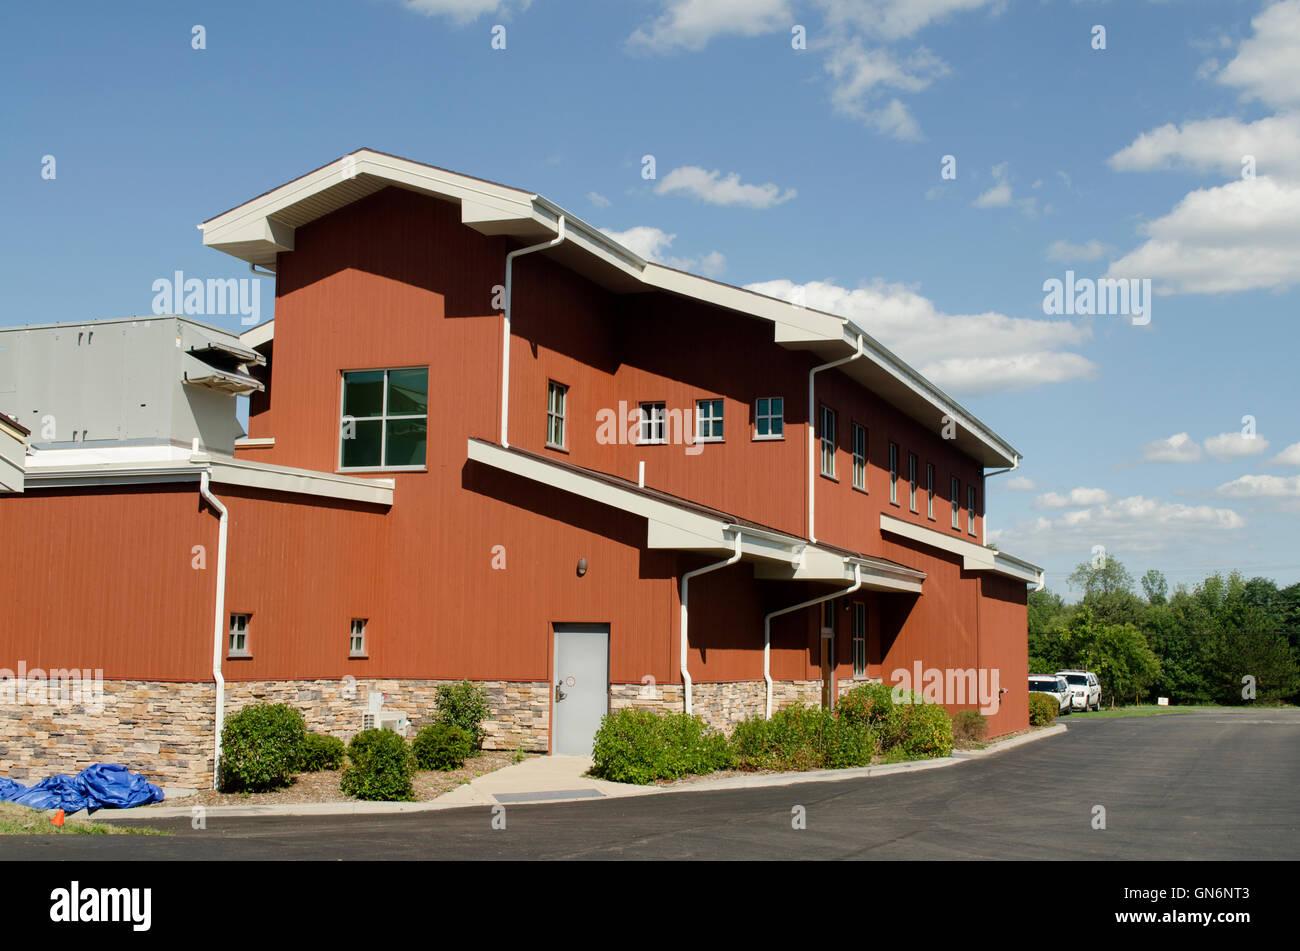 Humane Society building. - Stock Image